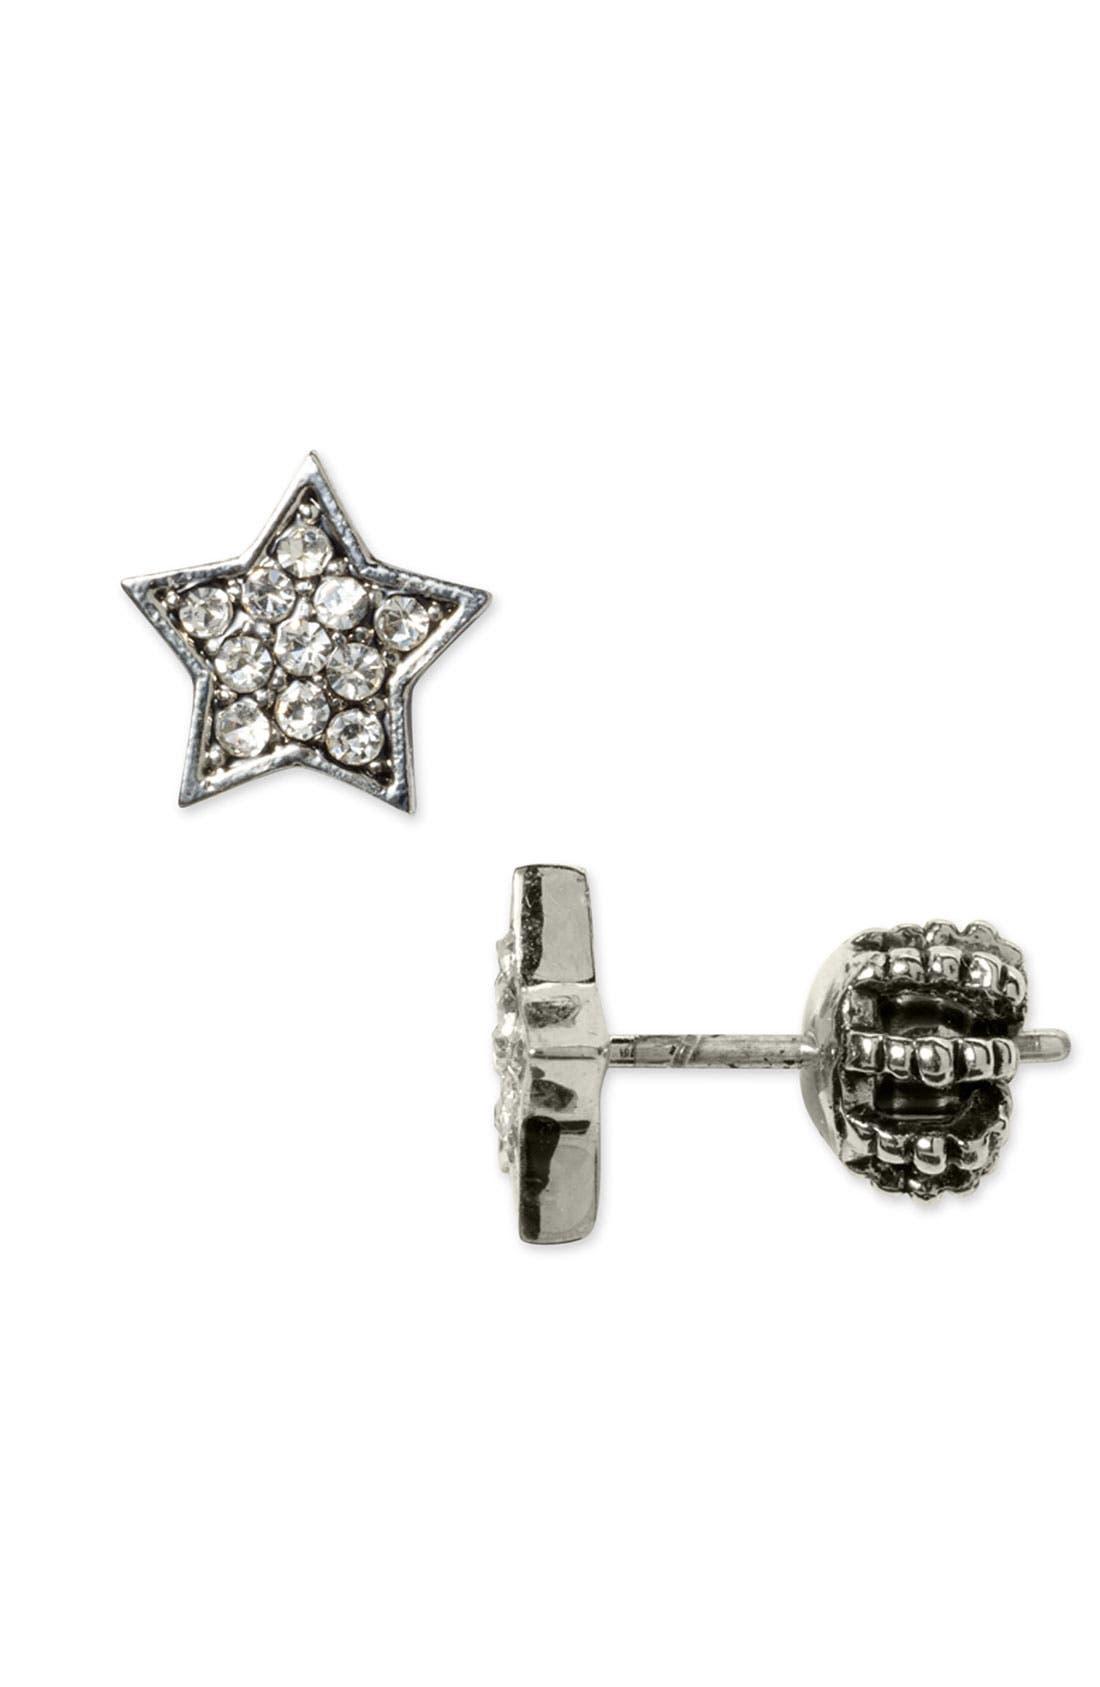 Main Image - Juicy Couture 'Star' Stud Earrings